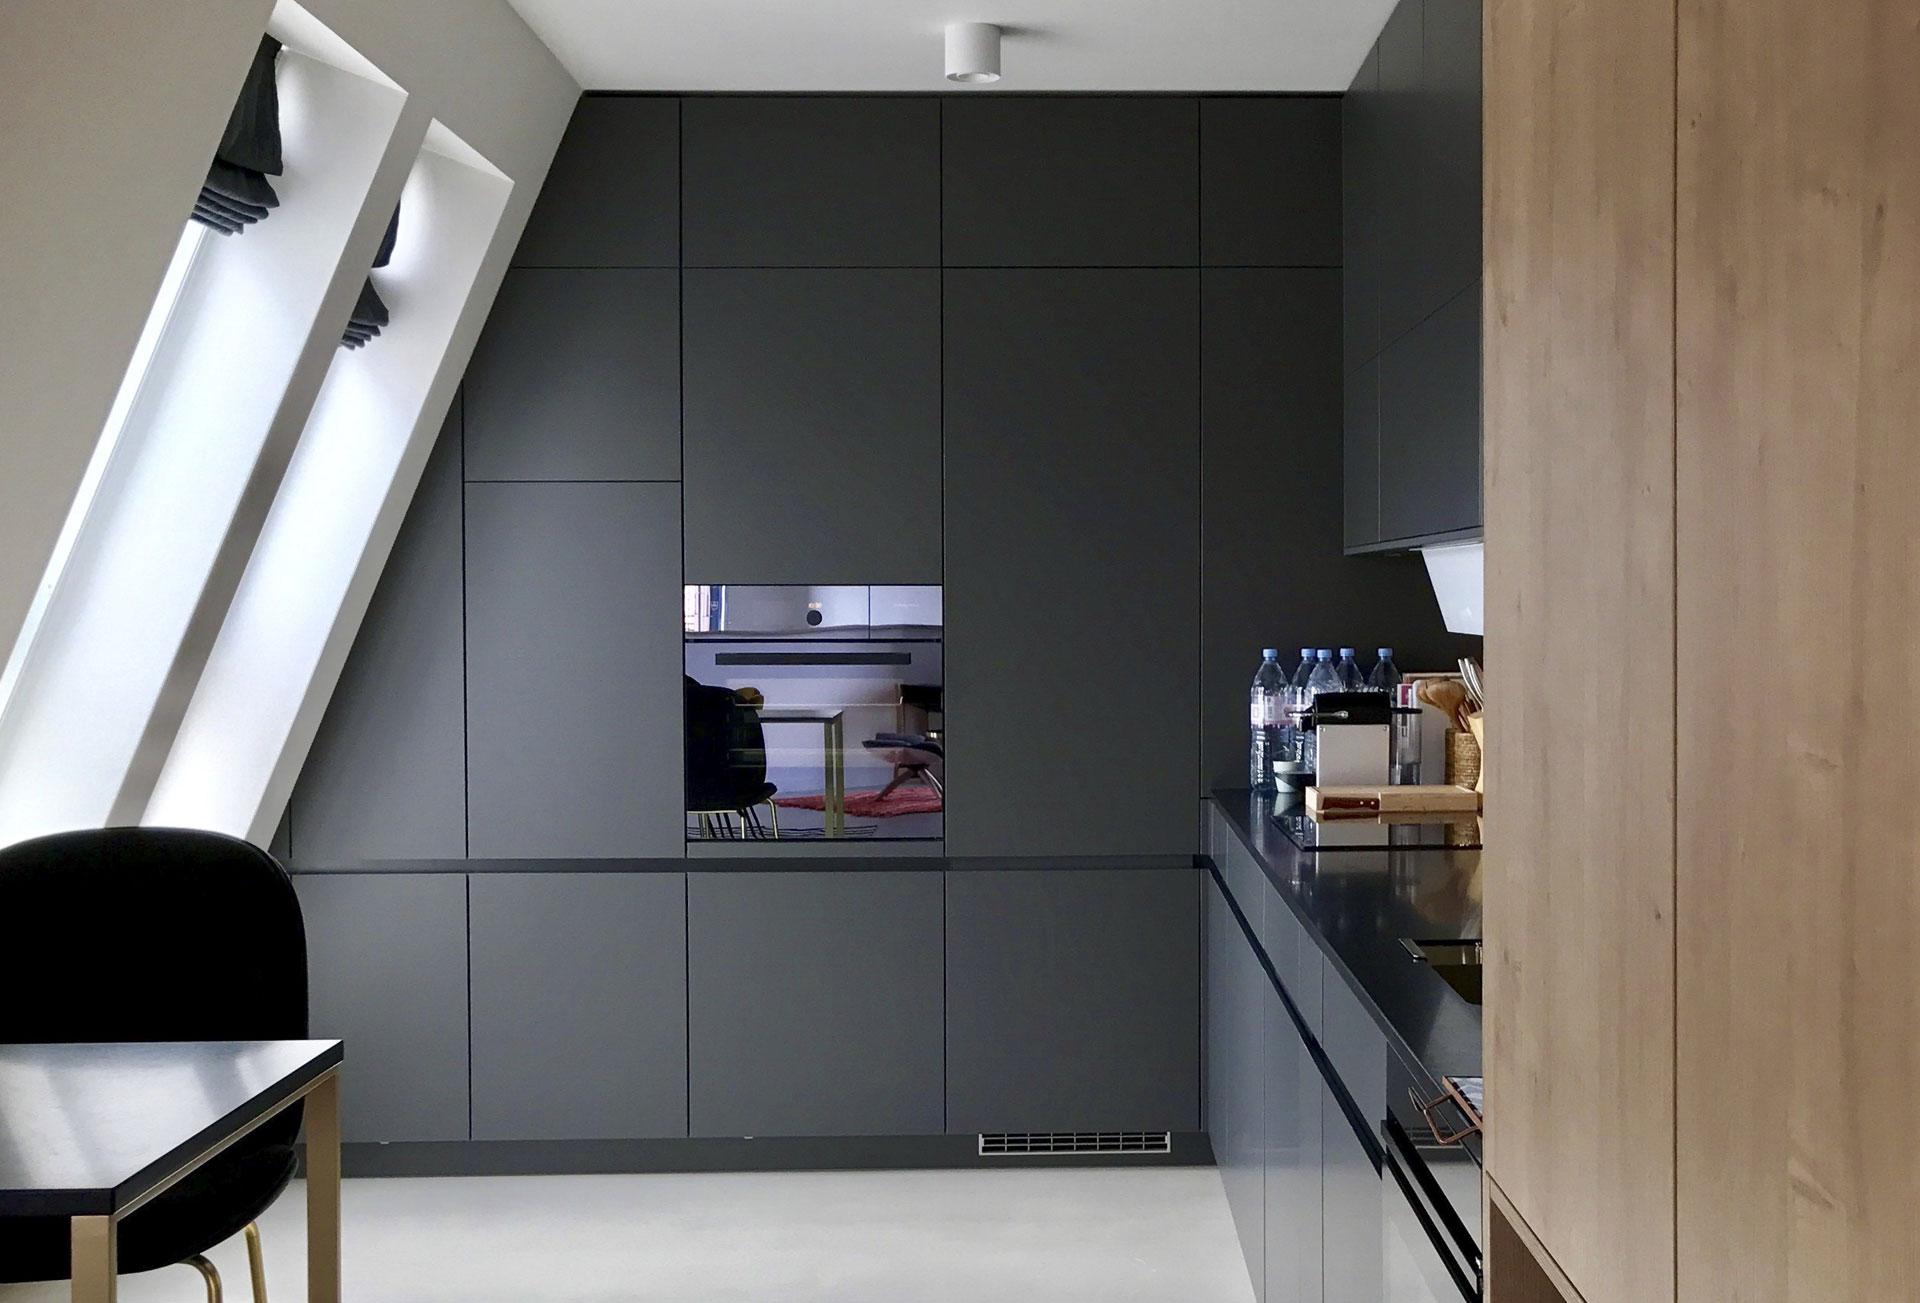 r alisation leicht mod le bondi orlando. Black Bedroom Furniture Sets. Home Design Ideas